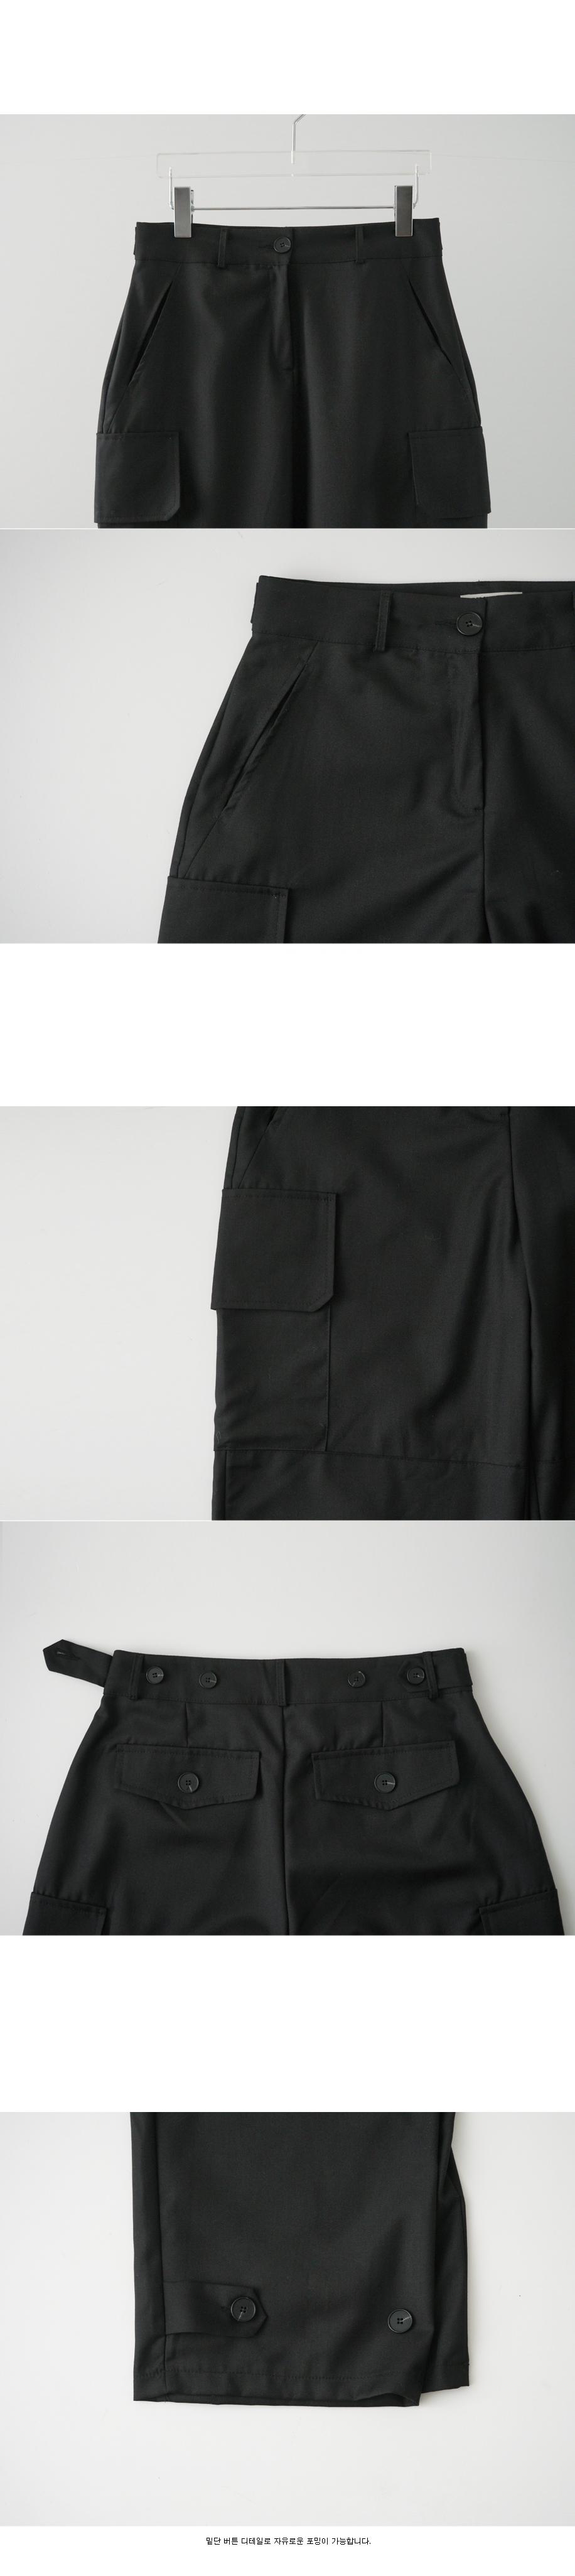 2-way silhouette cargo slacks